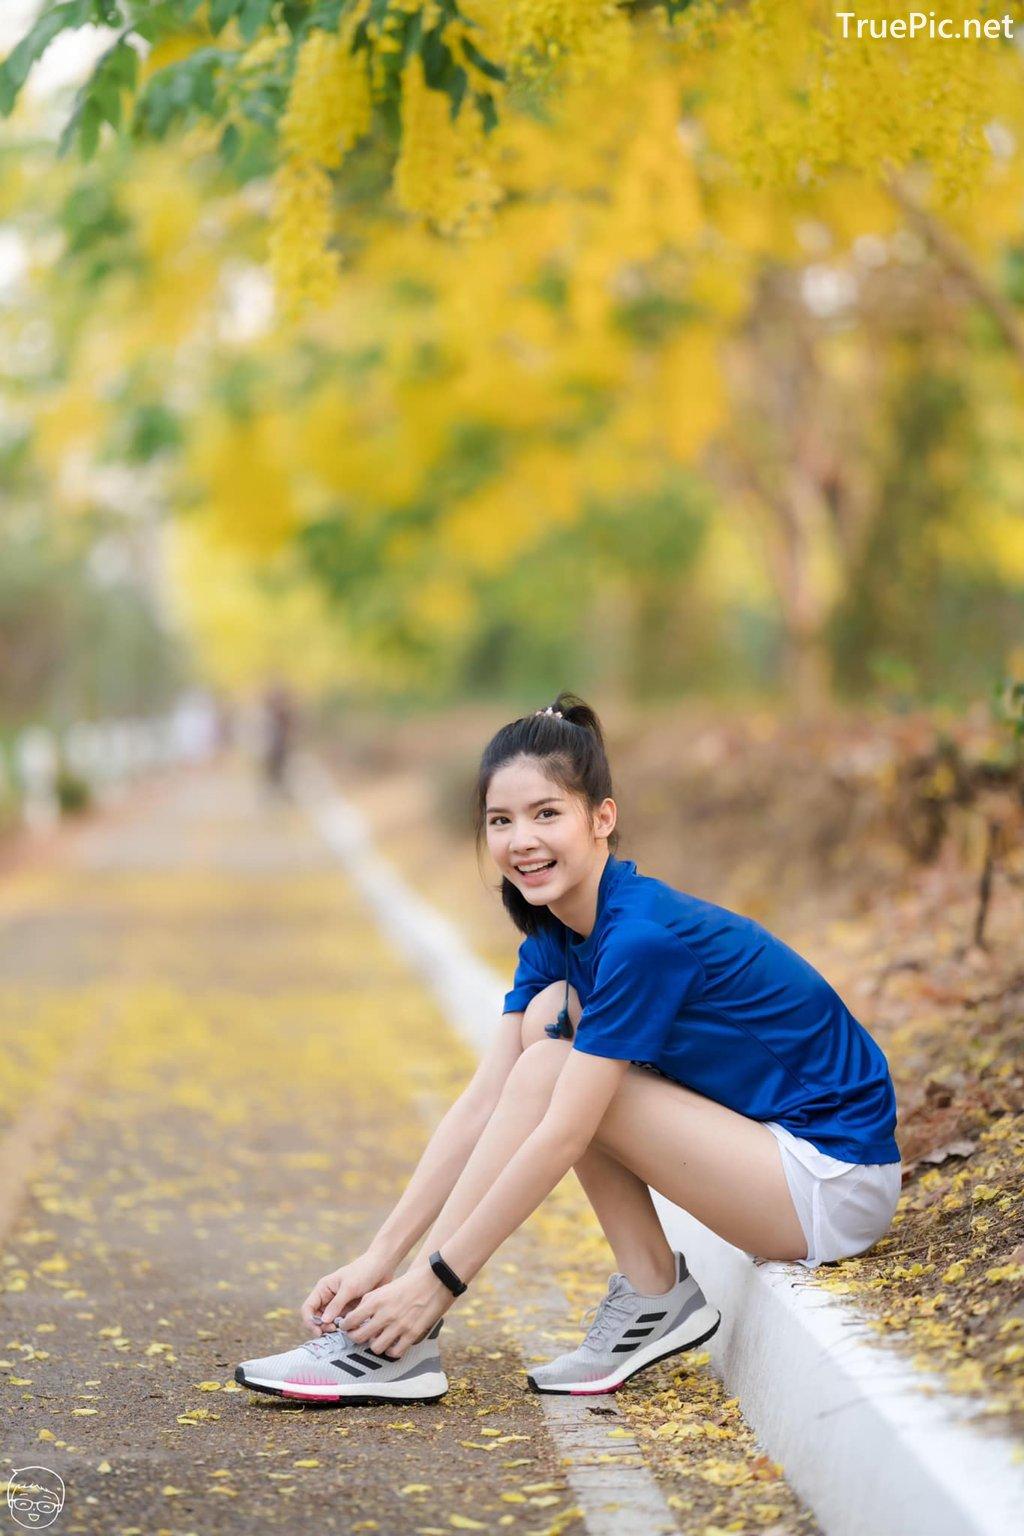 Image Thailand Model - Nuttacha Chayangkanont - Fun & Run - TruePic.net - Picture-3